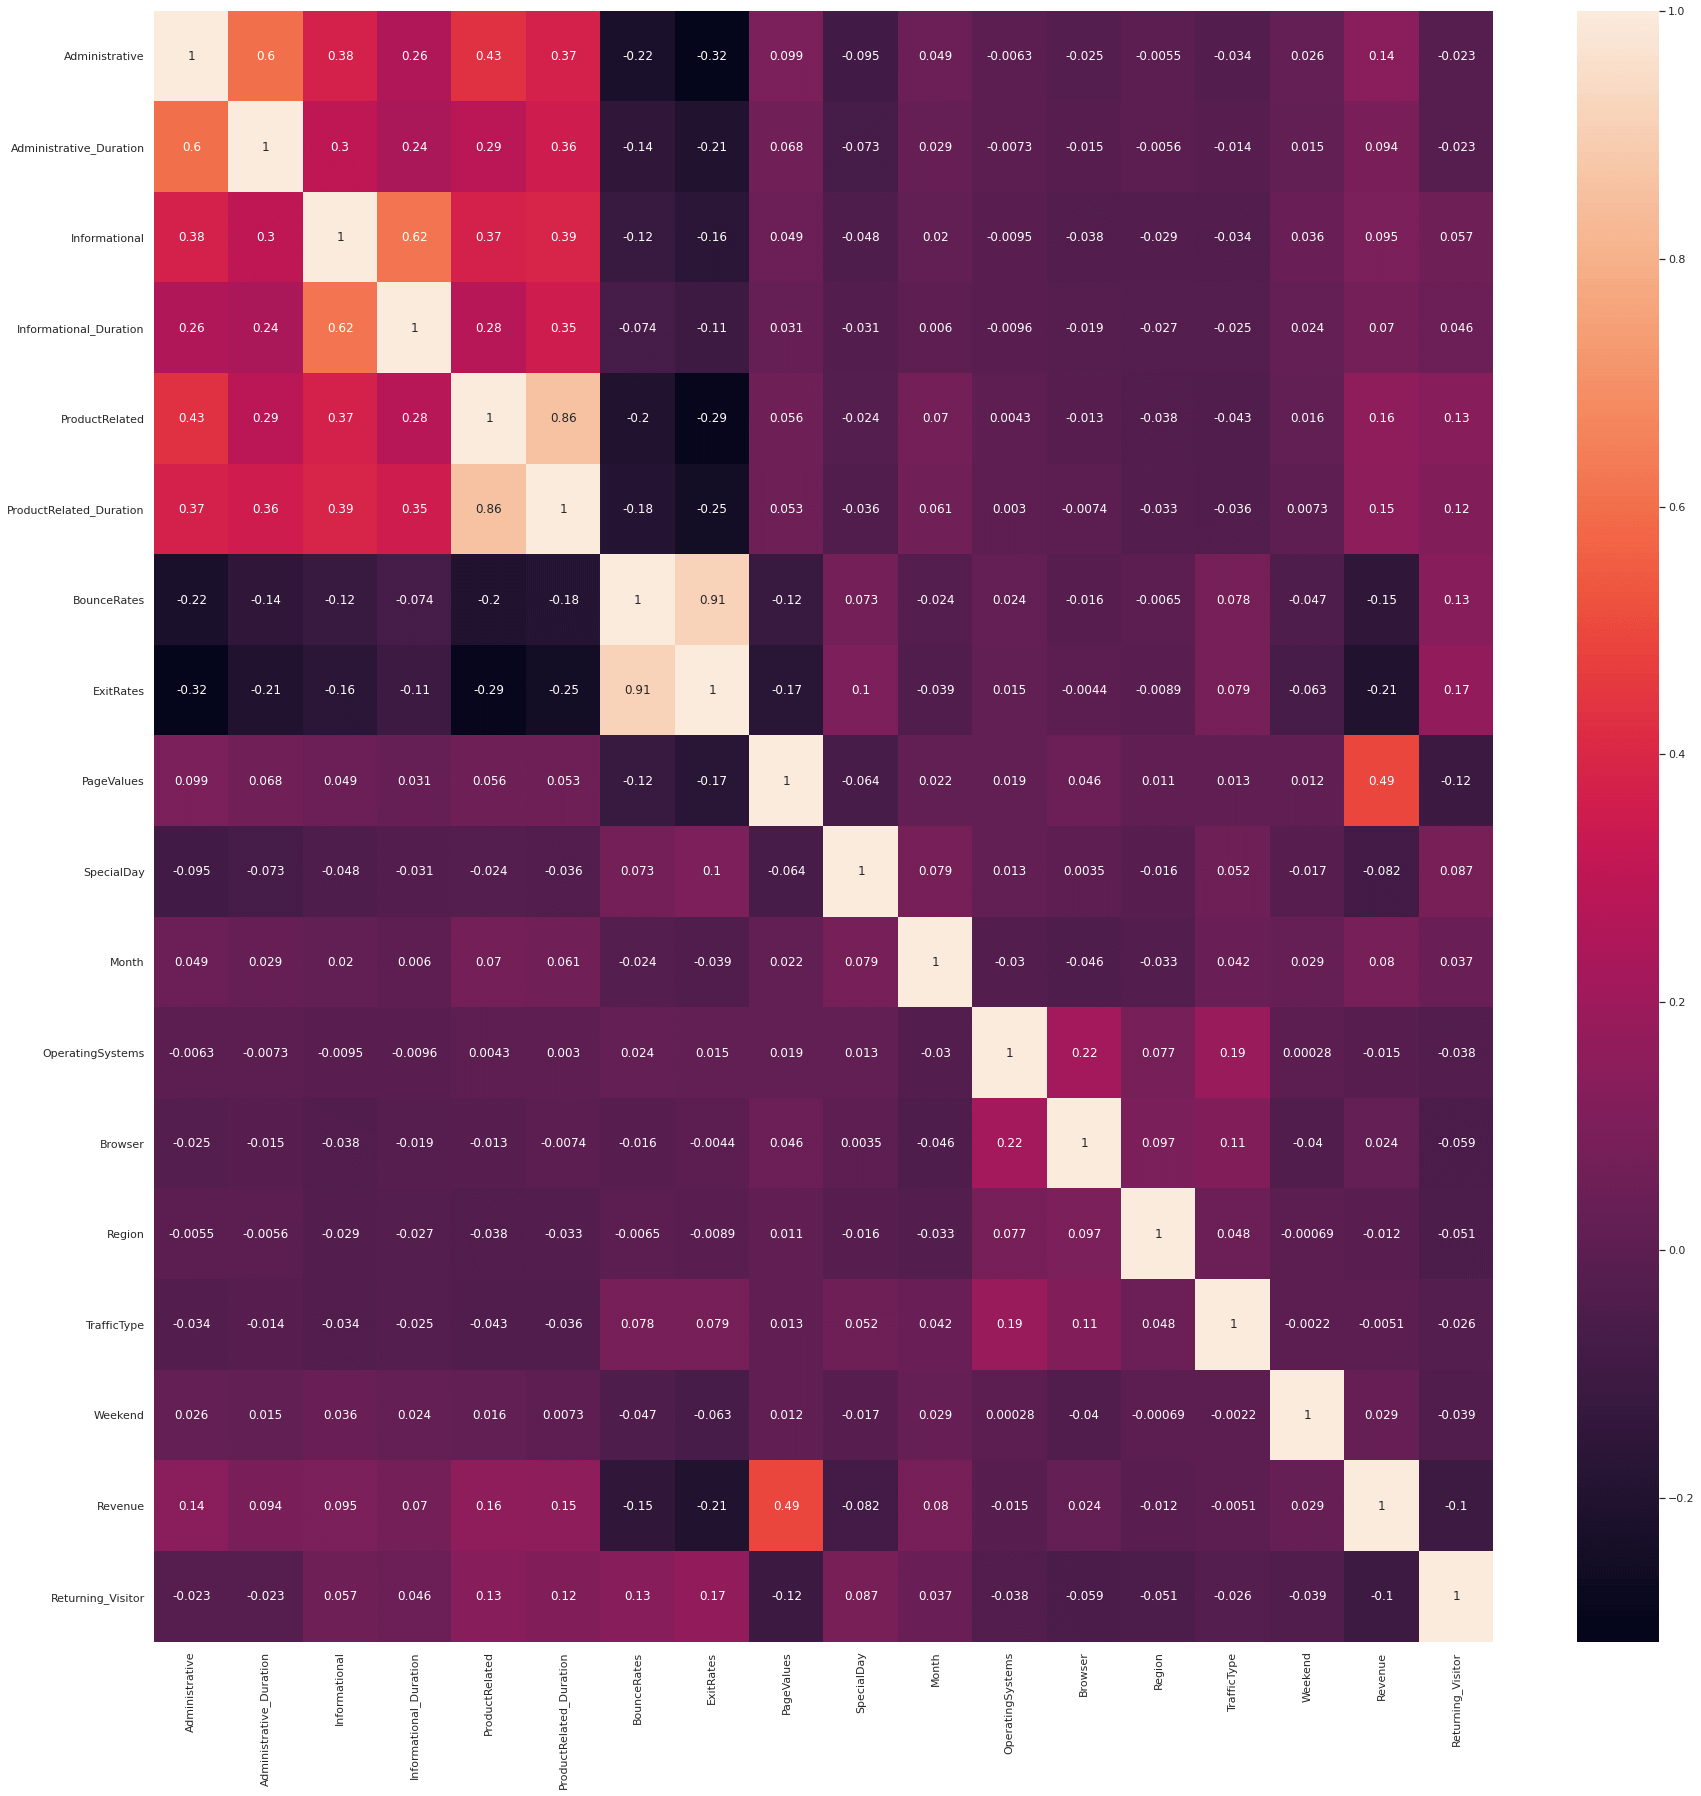 Pearson correlation matrix